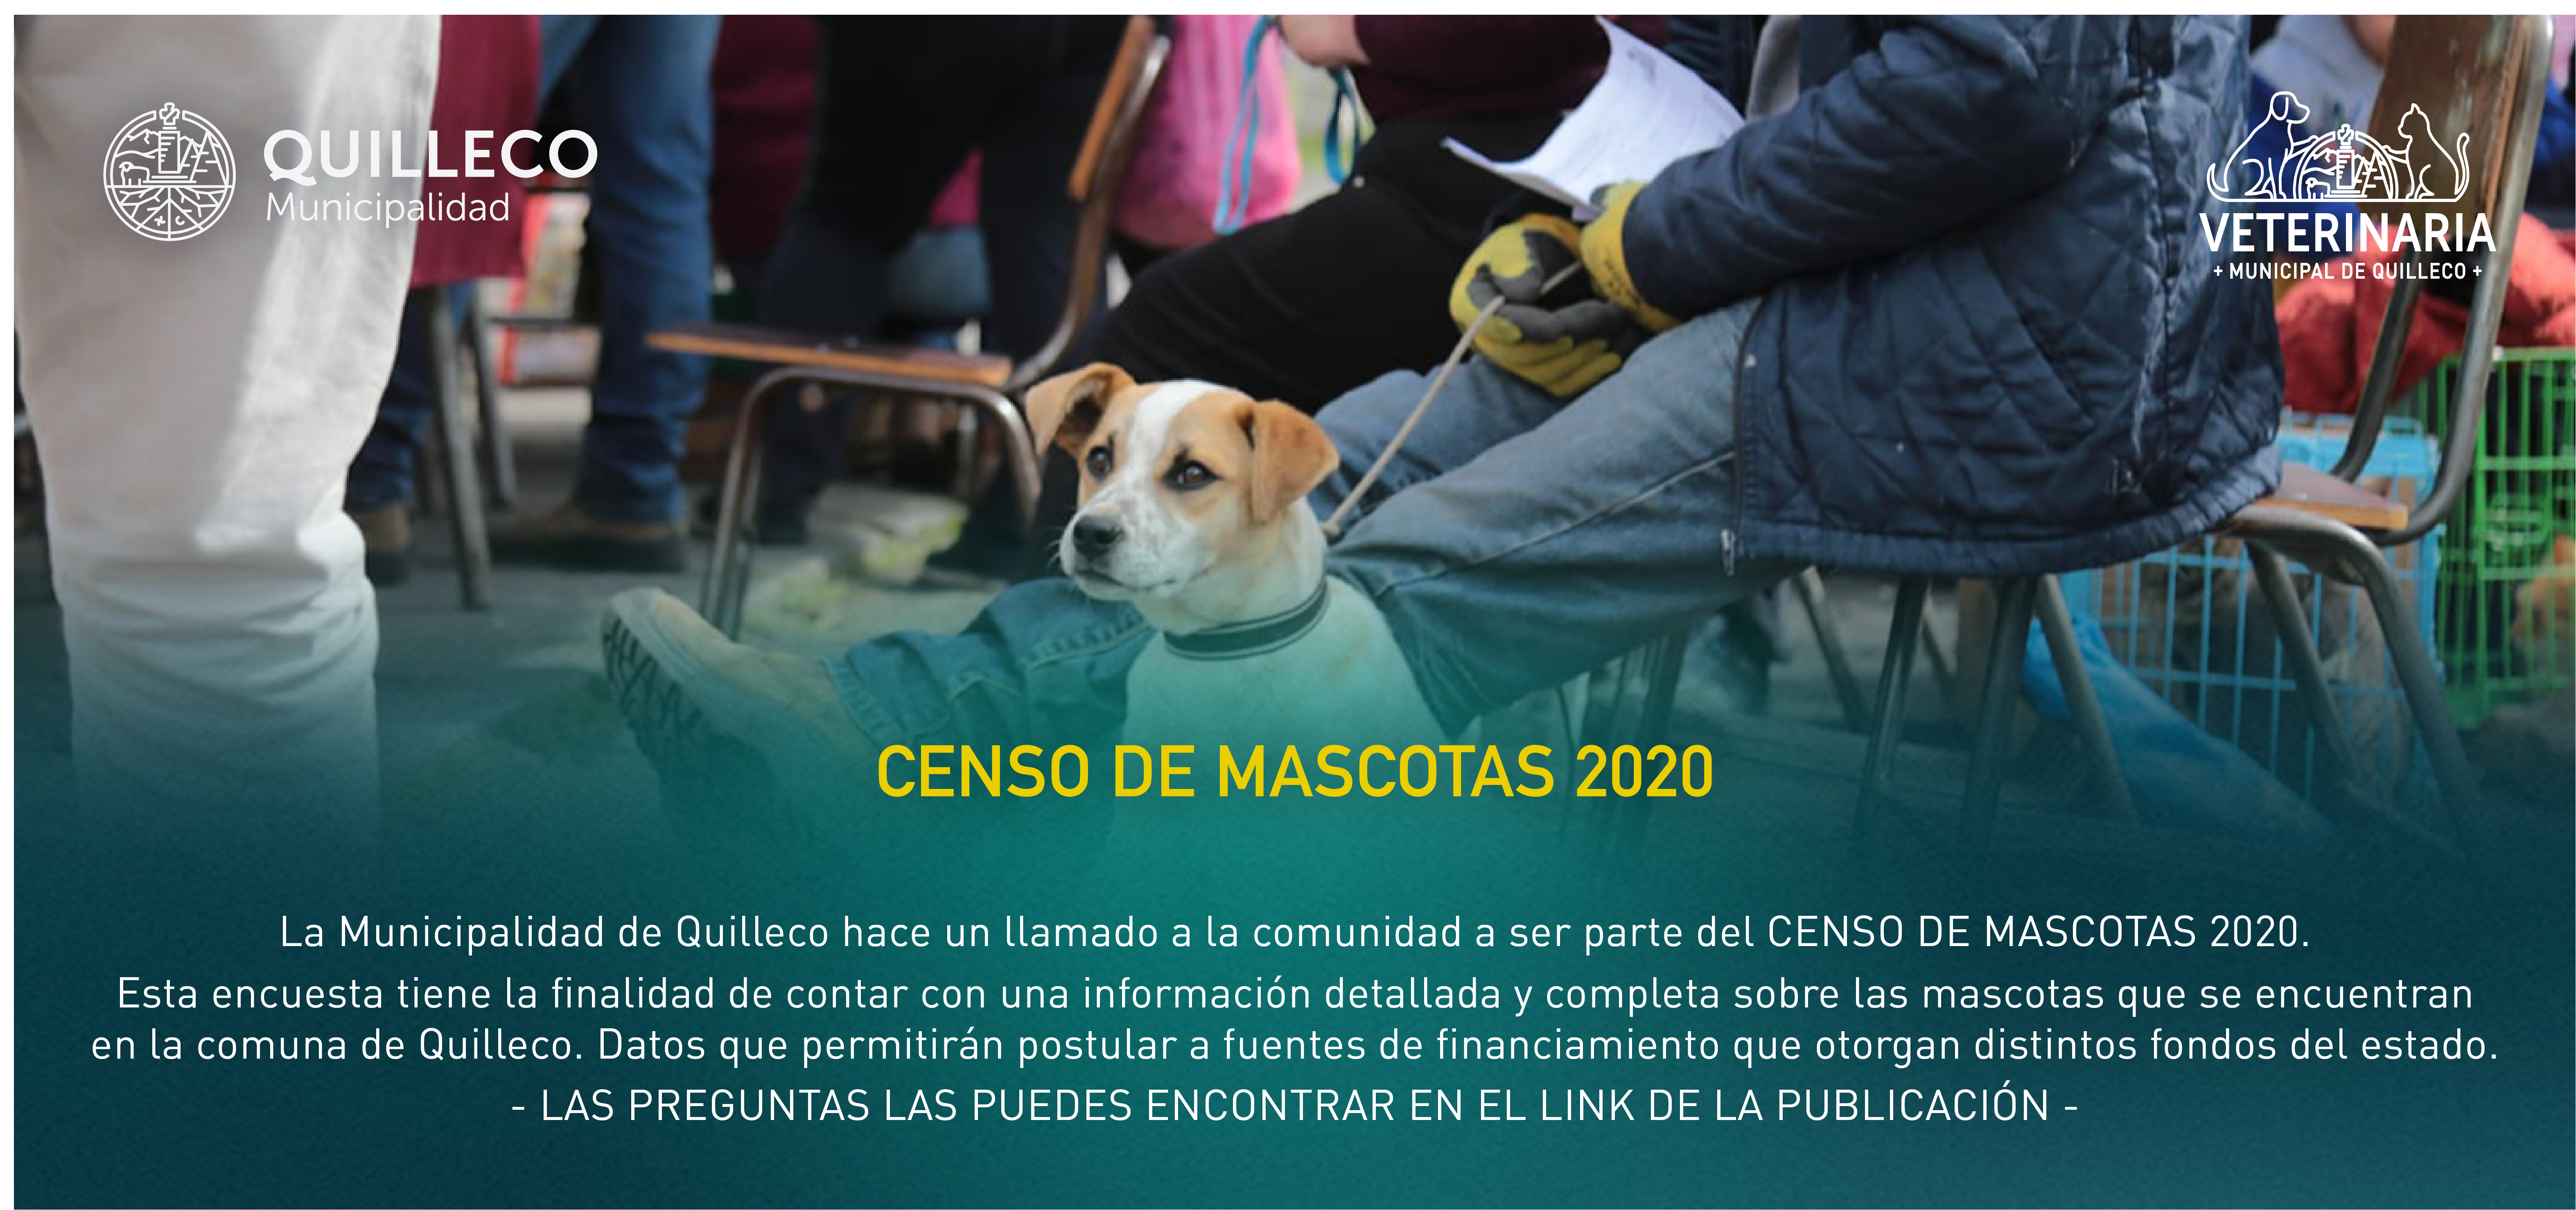 MUNICIPIO ENCABEZA PRIMER CENSO DE MASCOTAS DE LA COMUNA DE QUILLECO